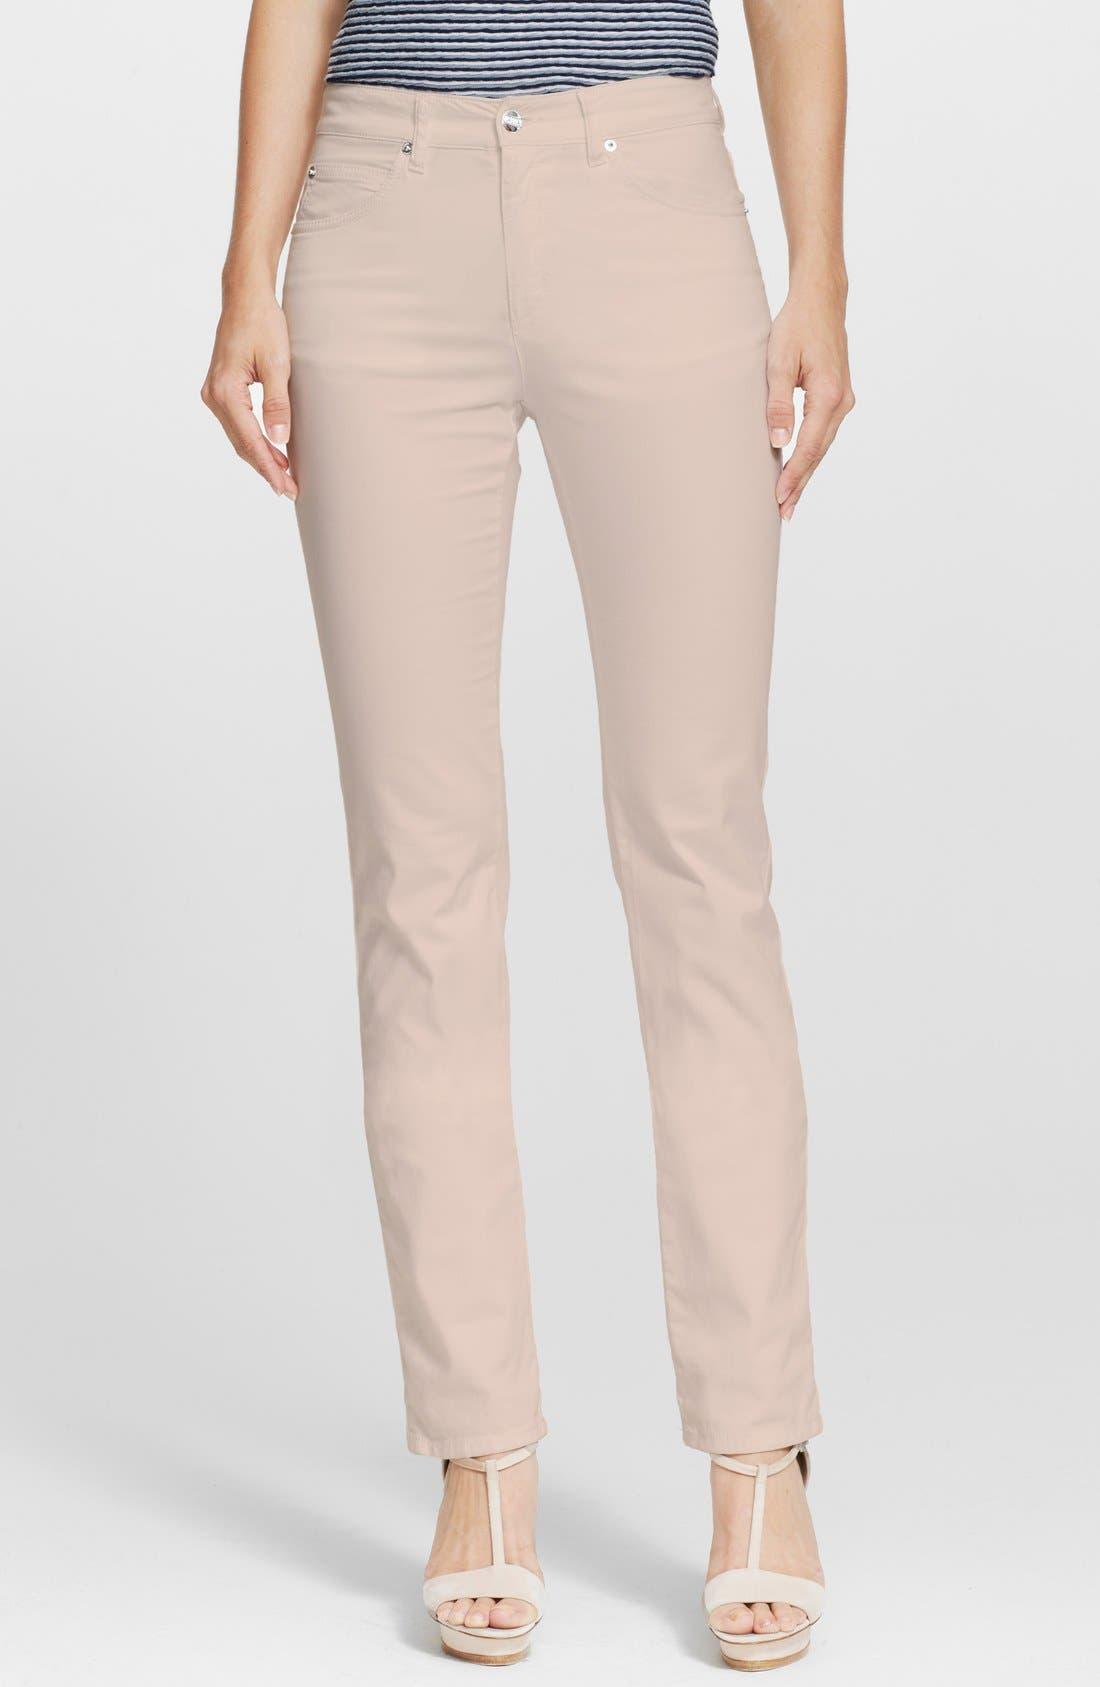 ARMANI COLLEZIONI, Slim Brushed Cotton Jeans, Main thumbnail 1, color, 272